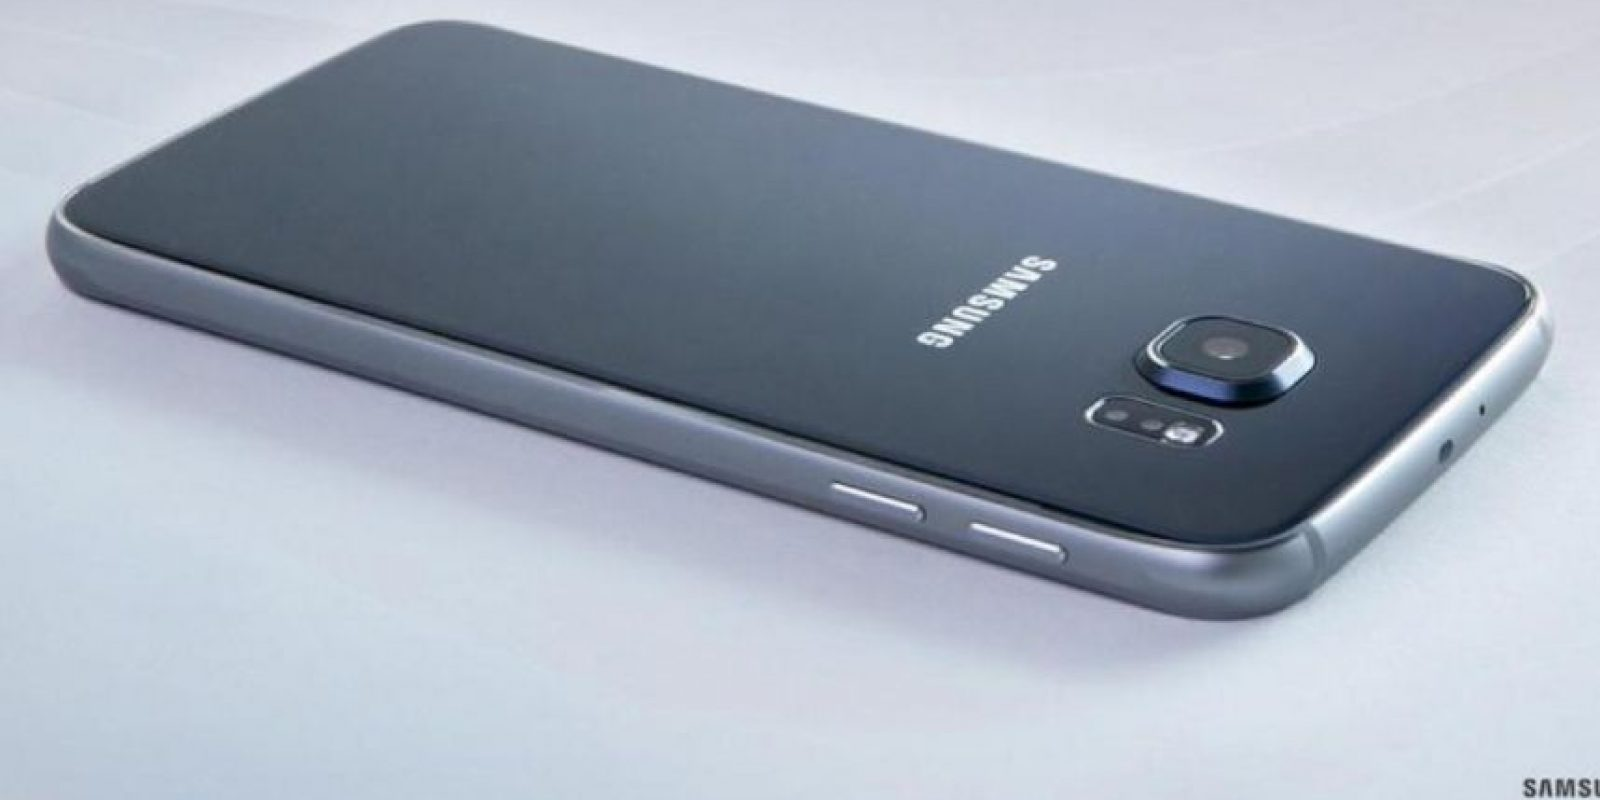 Samsung Galaxy S6 fue introducido a un horno de microondas. Foto:twitter.com/SamsungMobile